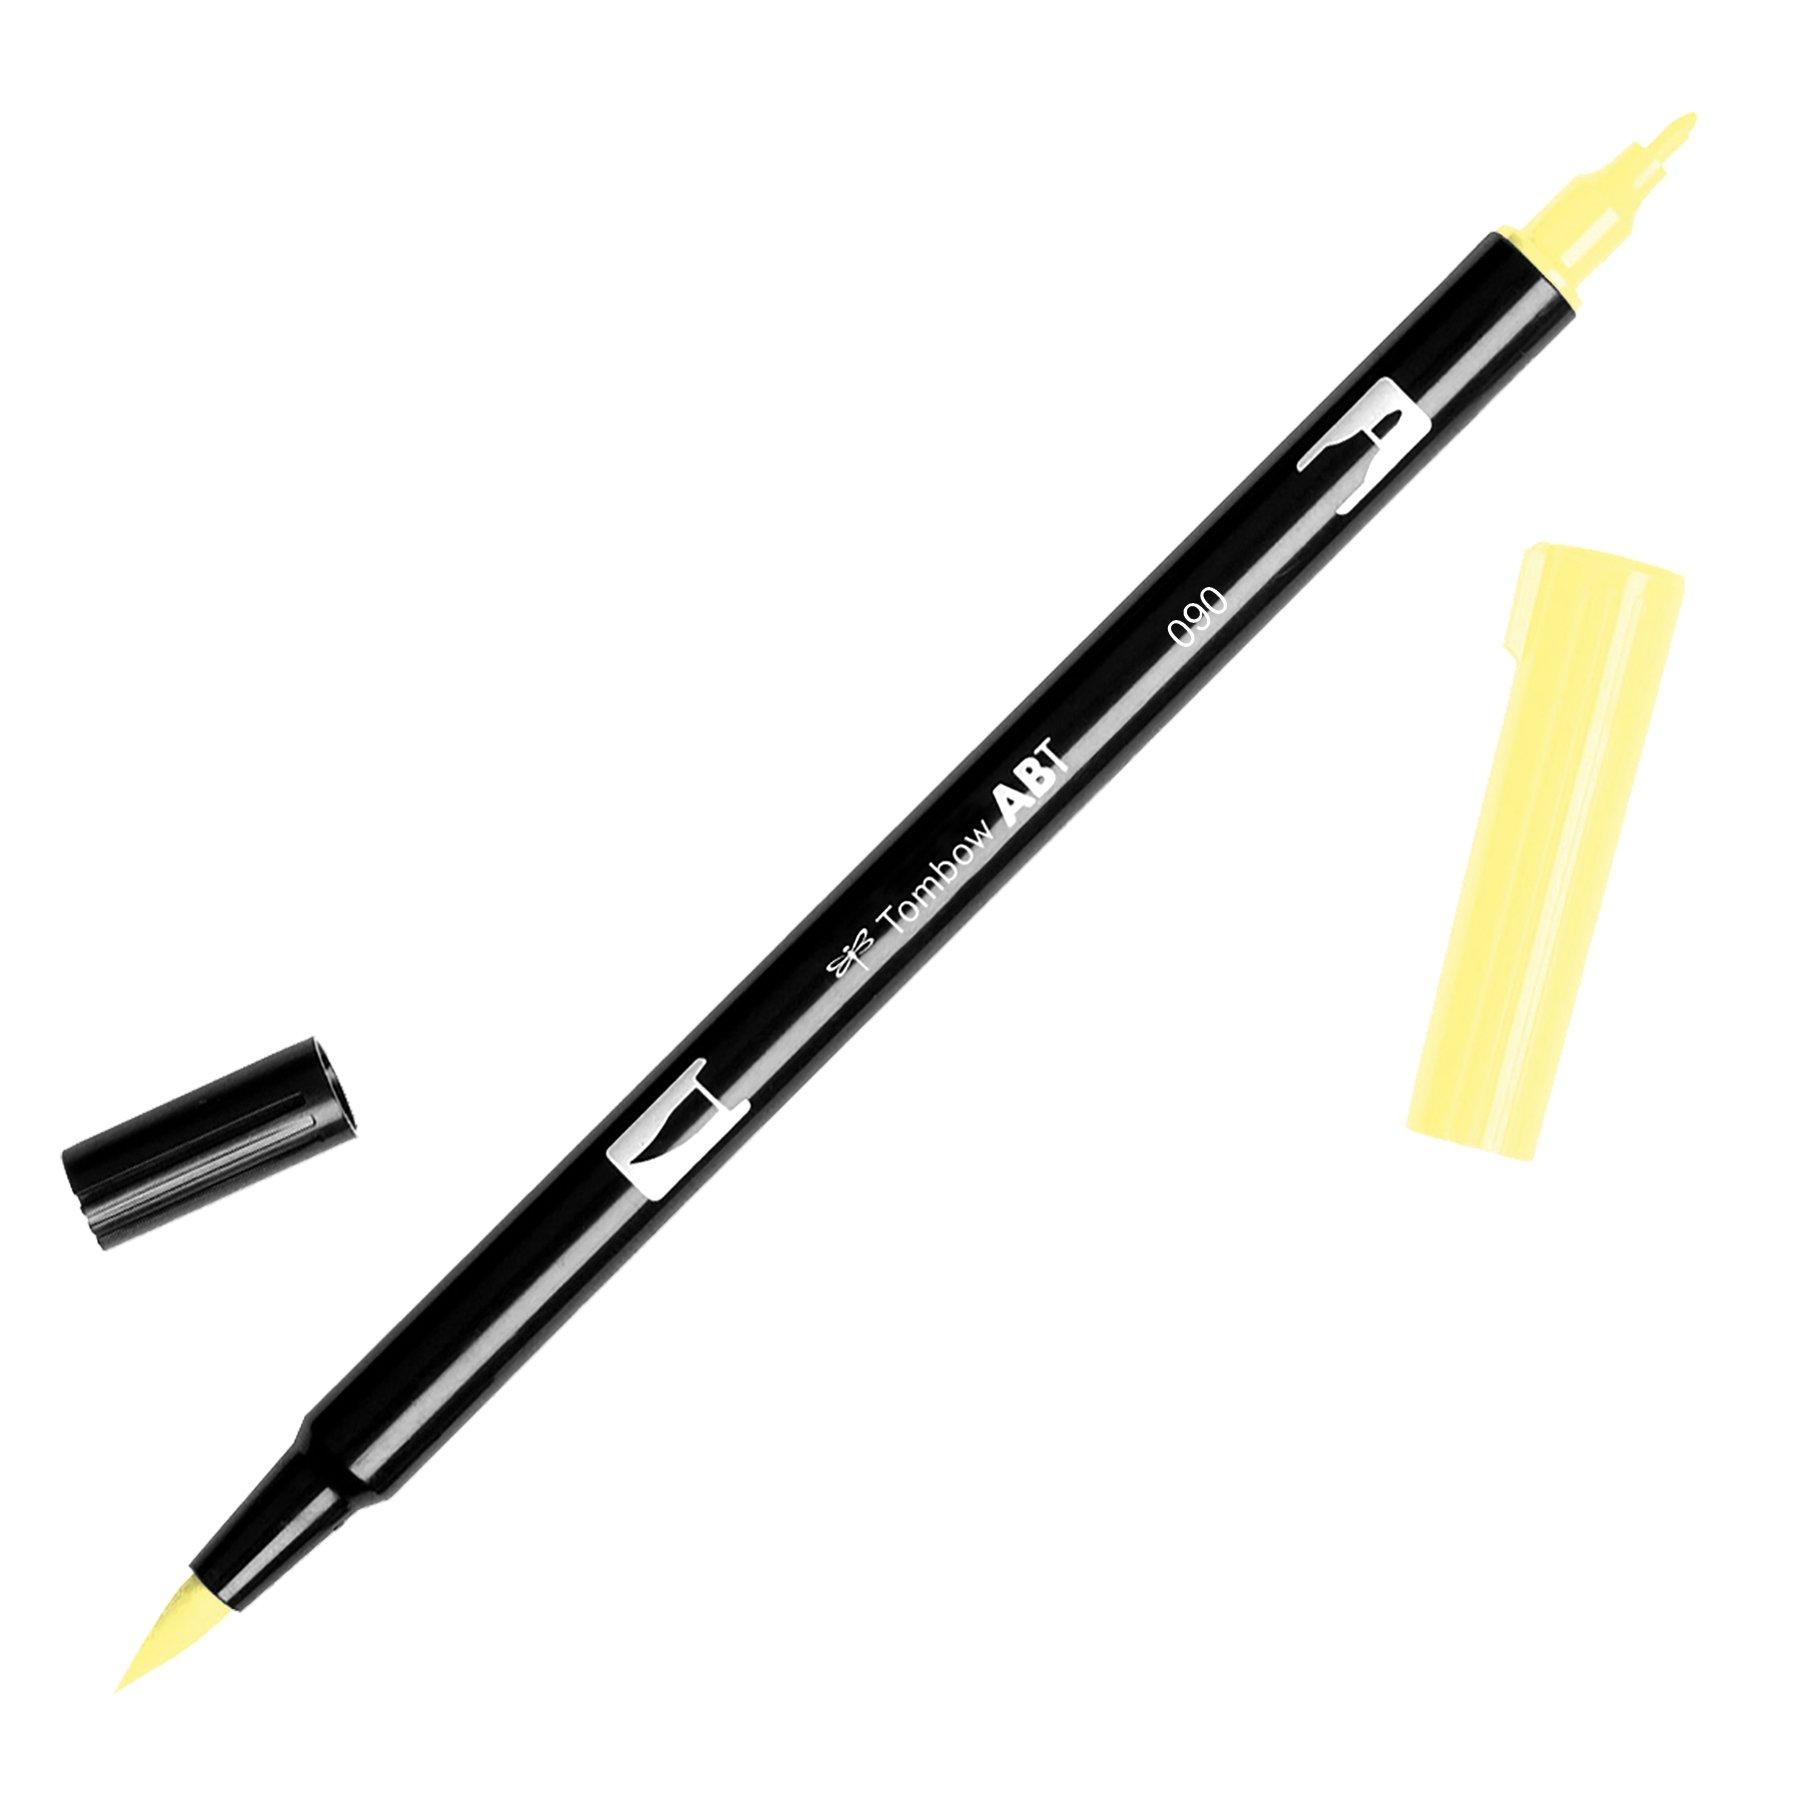 Tombow Dual Brush Pen Art Marker, 090 - Baby Yellow, 1-Pack